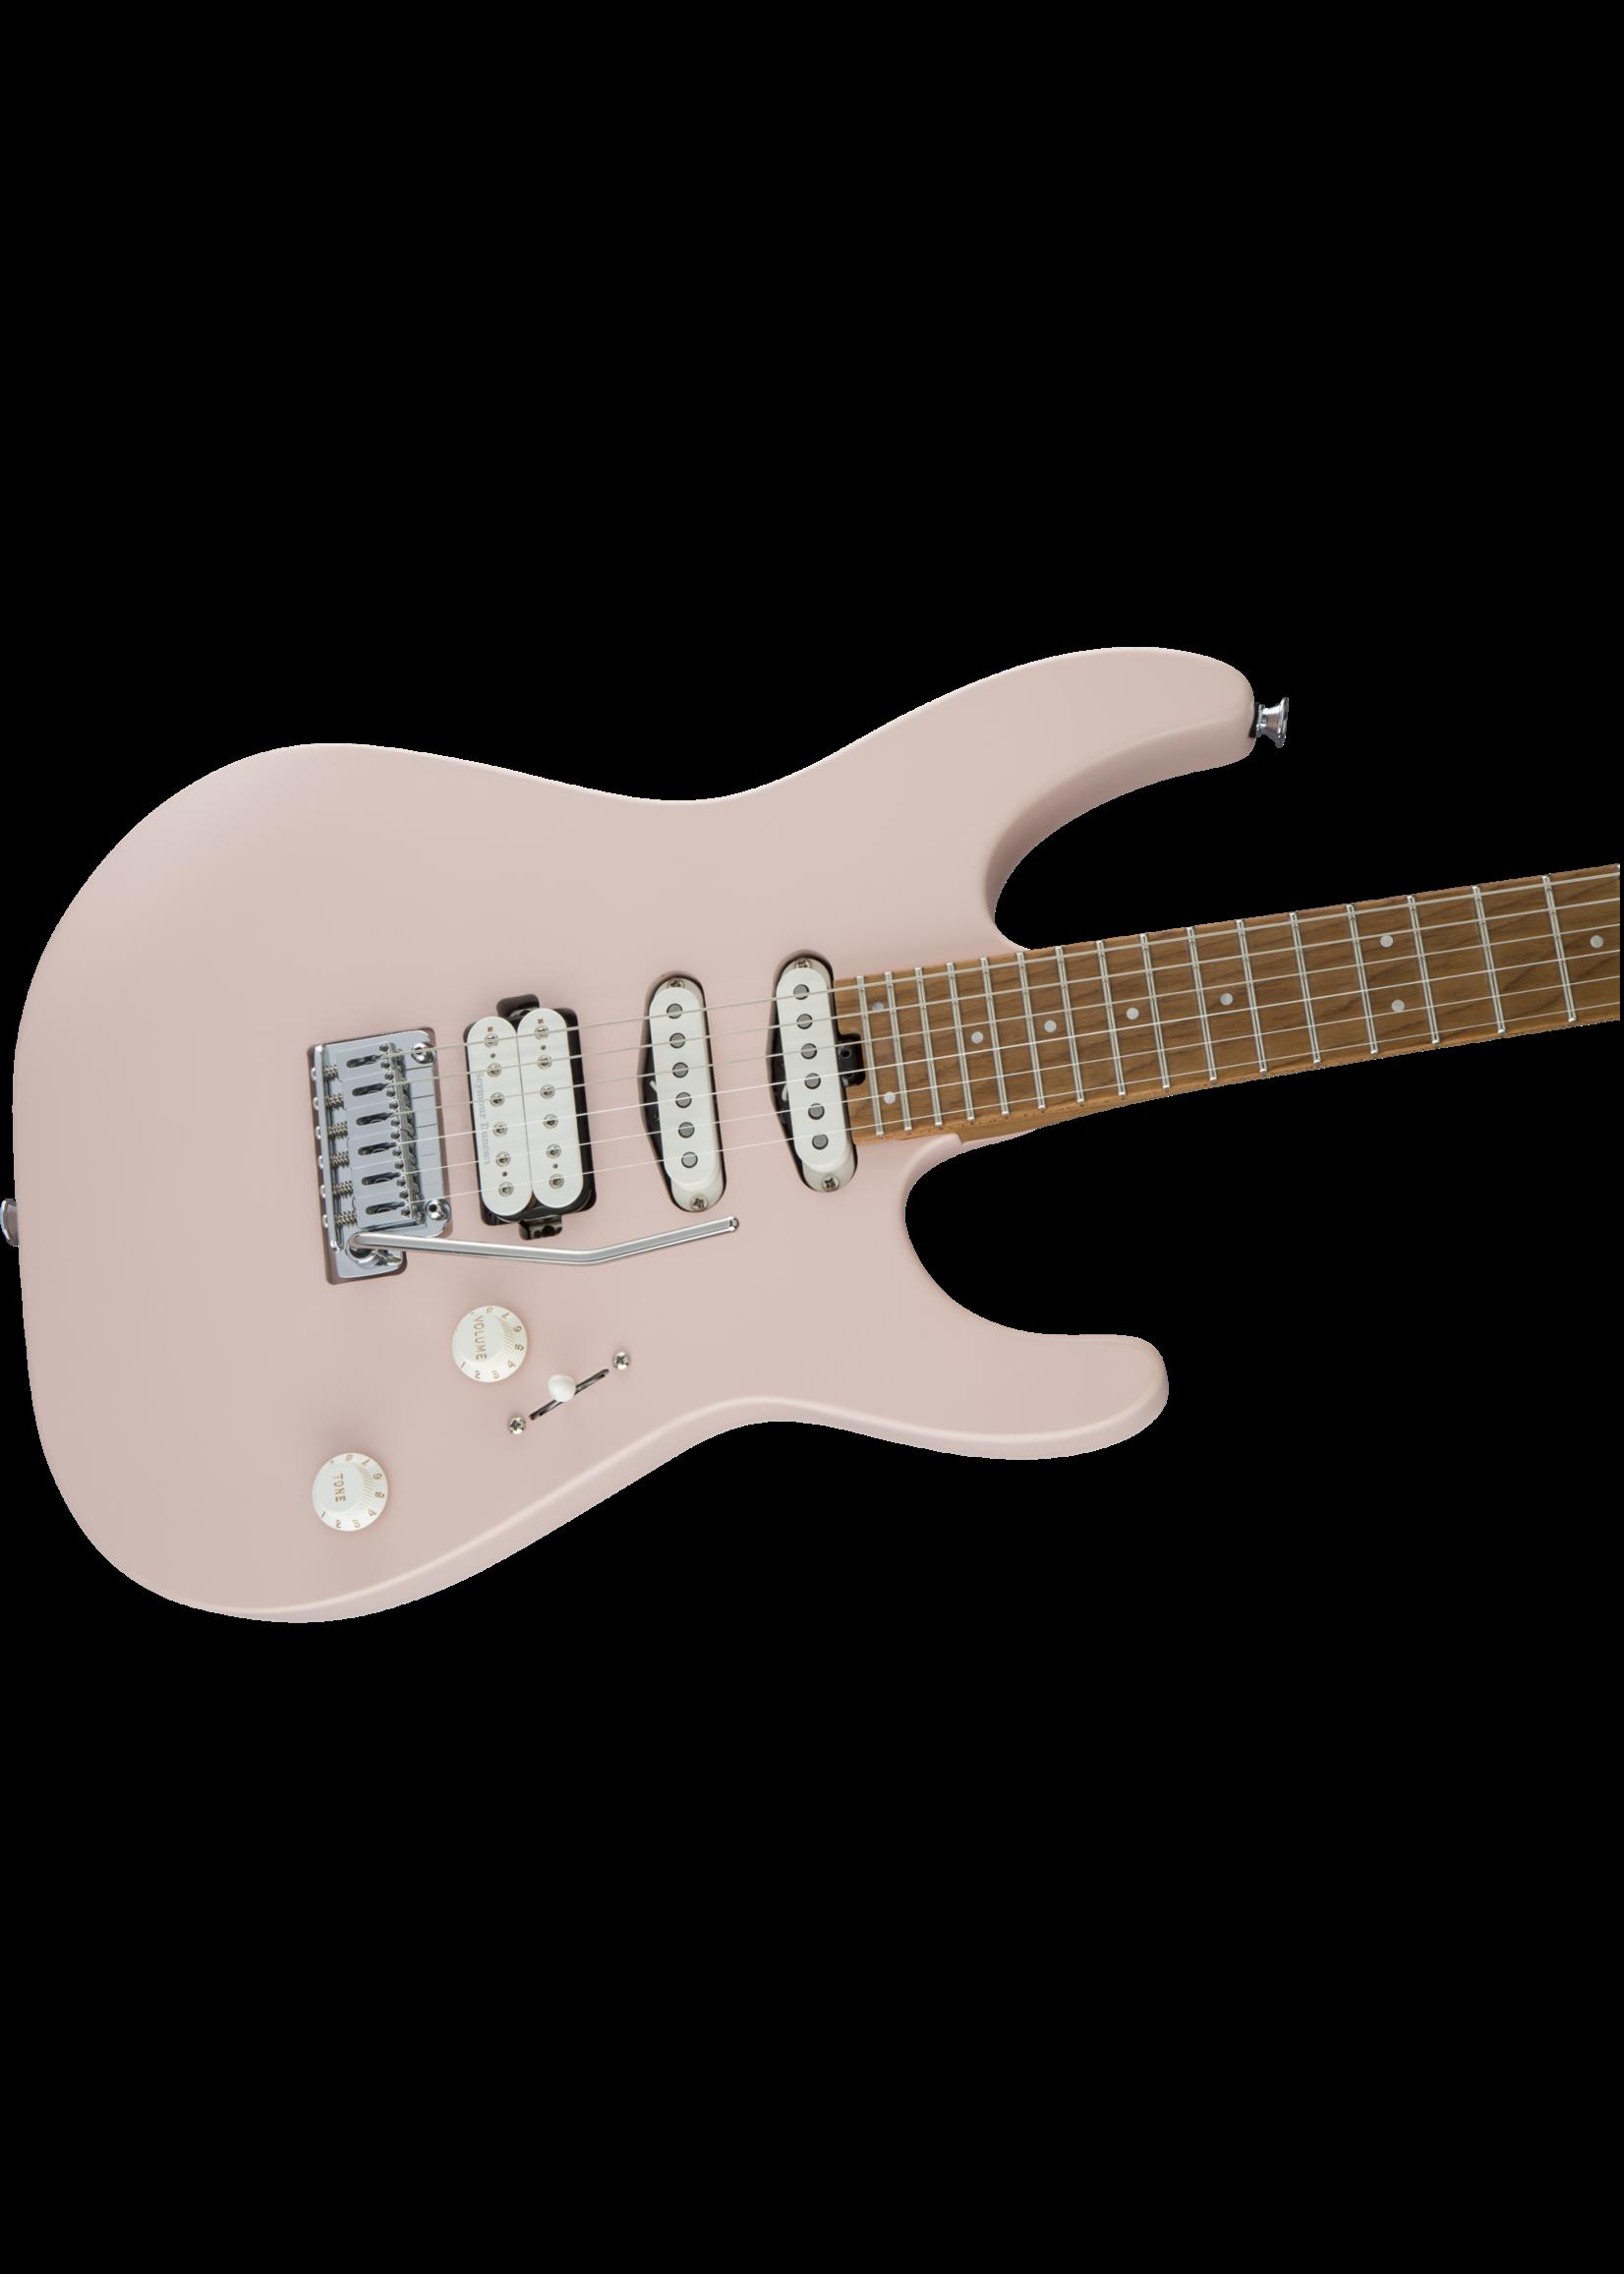 Charvel Charvel Pro-Mod DK24 HSS 2PT CM Caramelized Maple Fingerboard Satin Shell Pink